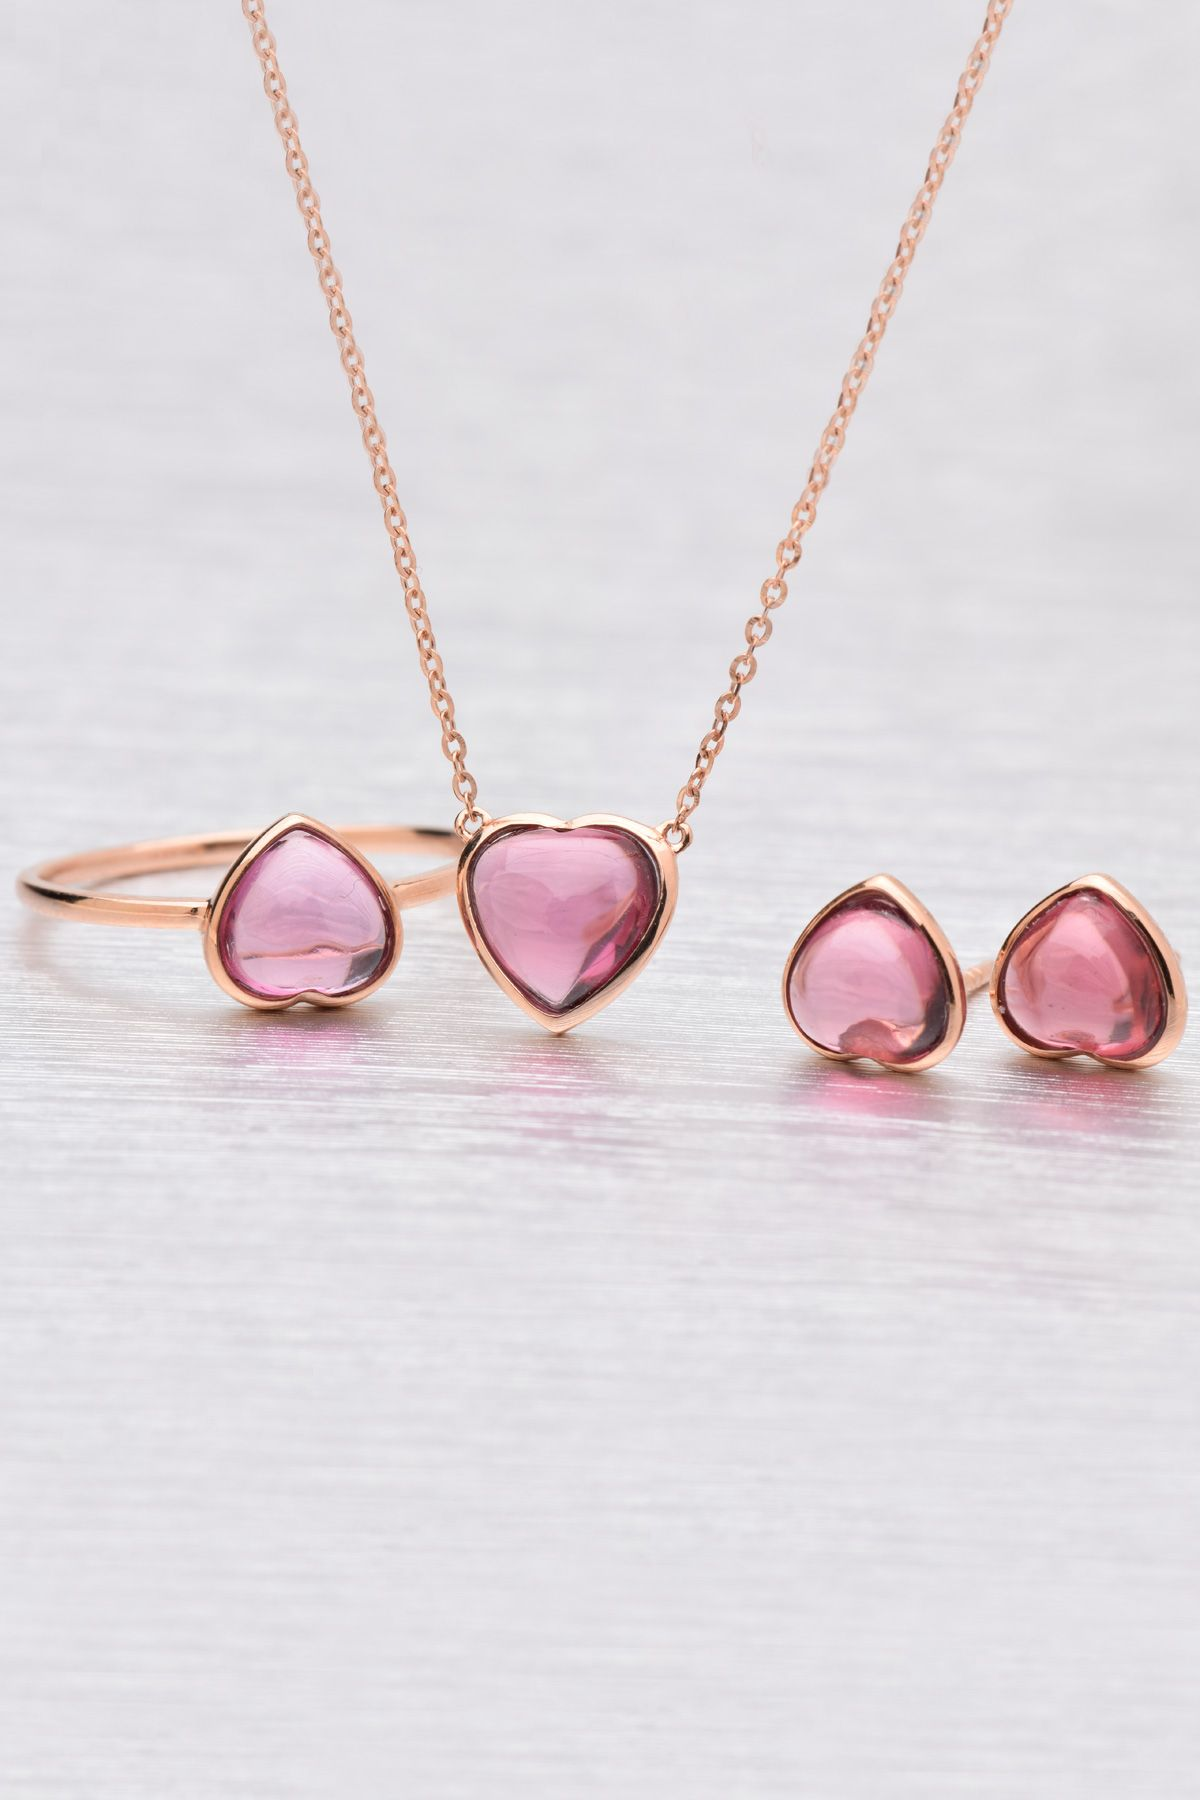 Garnet heart necklace set jewellery pinterest jewlery jewel